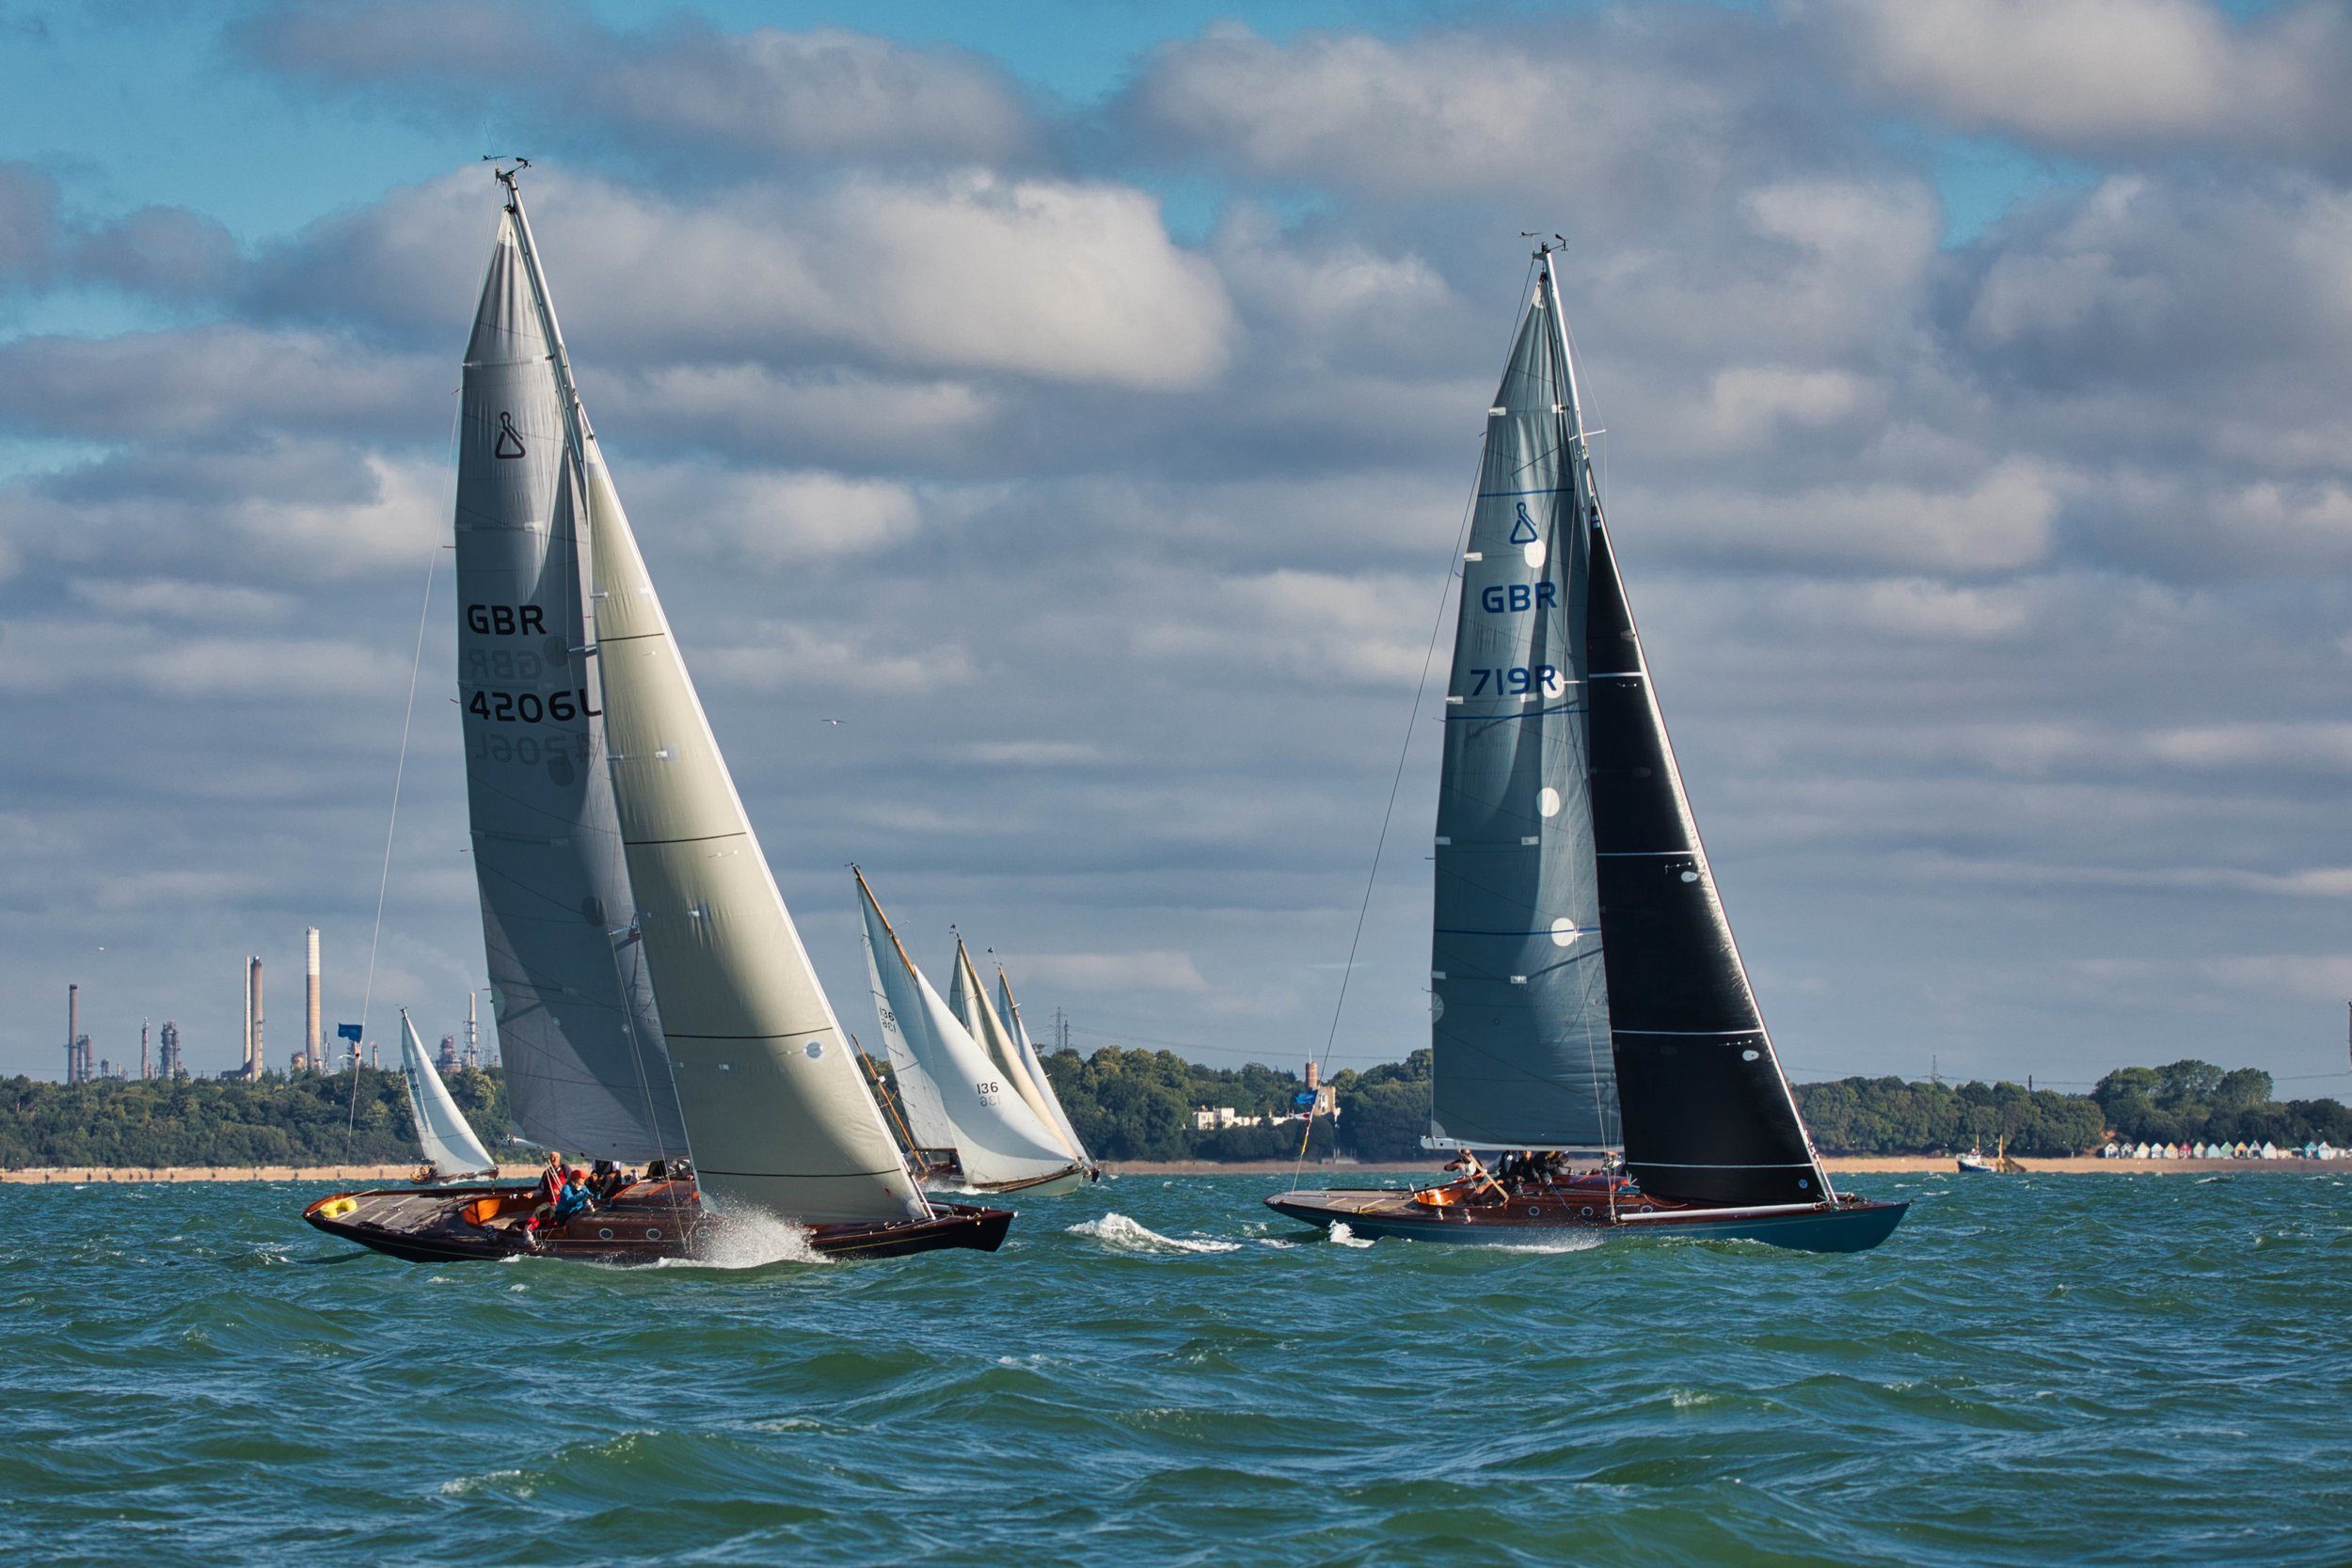 Spirit yachts on the upwind leg towards the forts